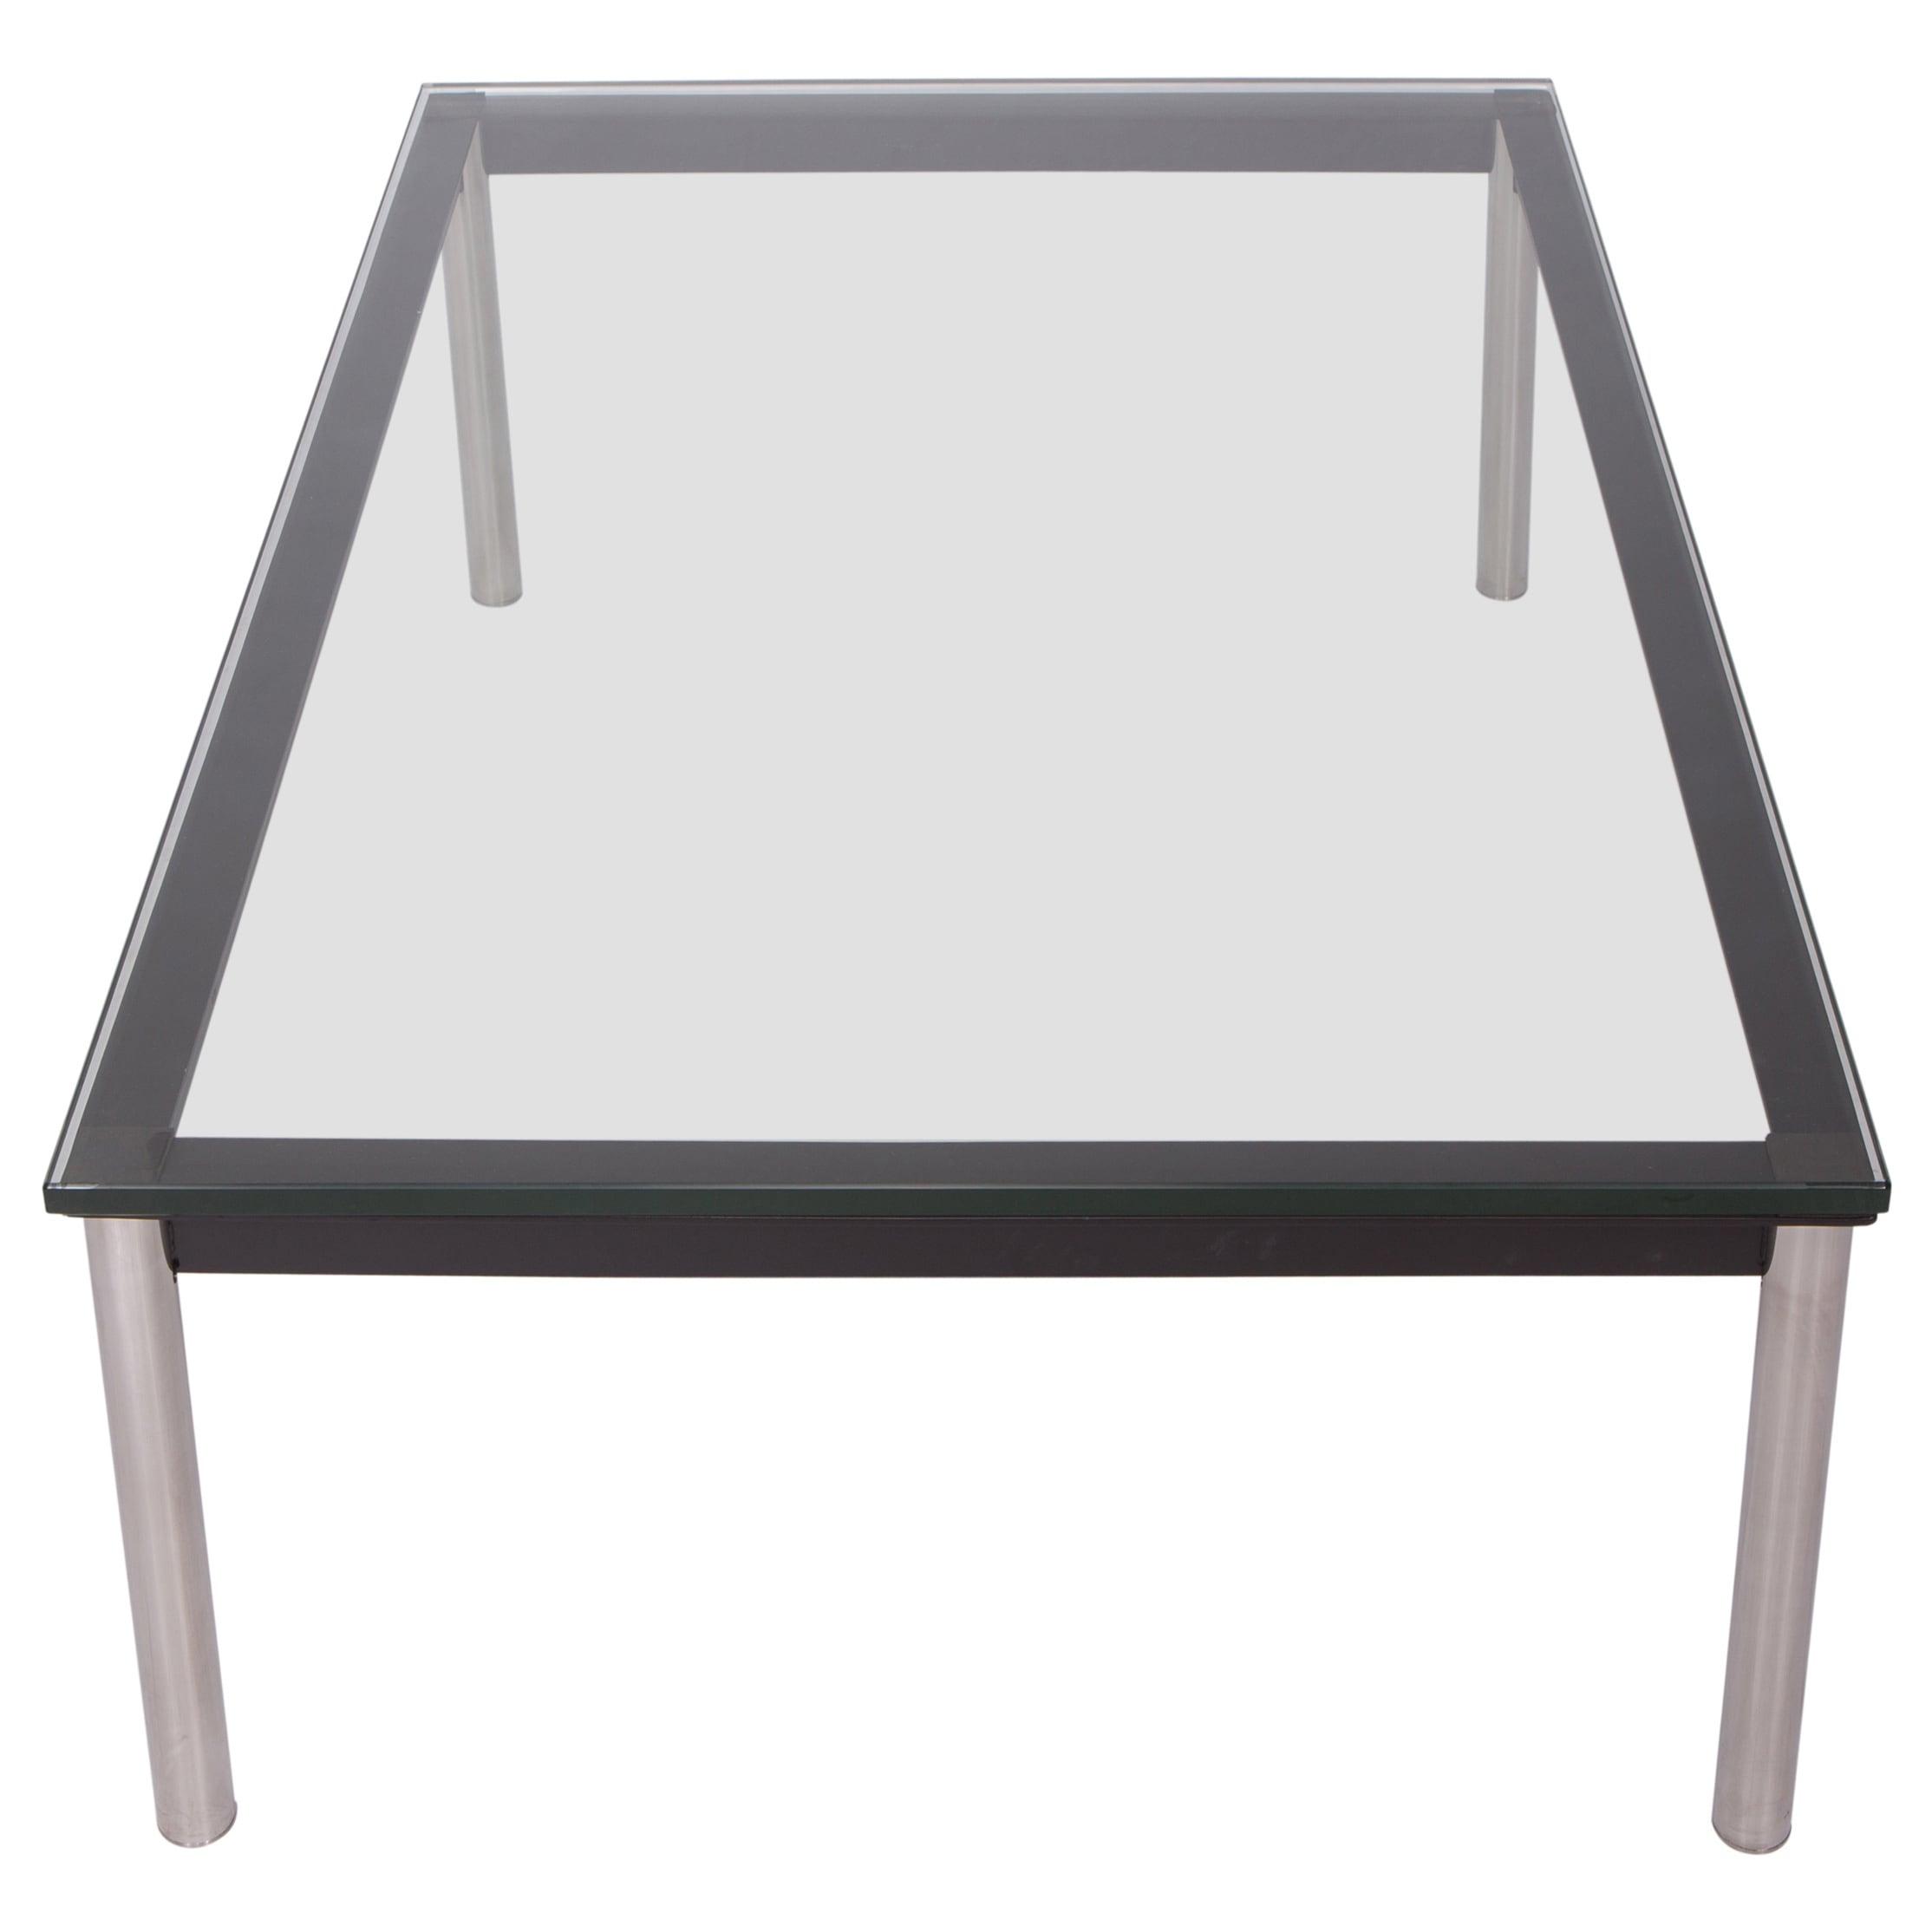 Ramson Rectangular Glass-top Coffee Table